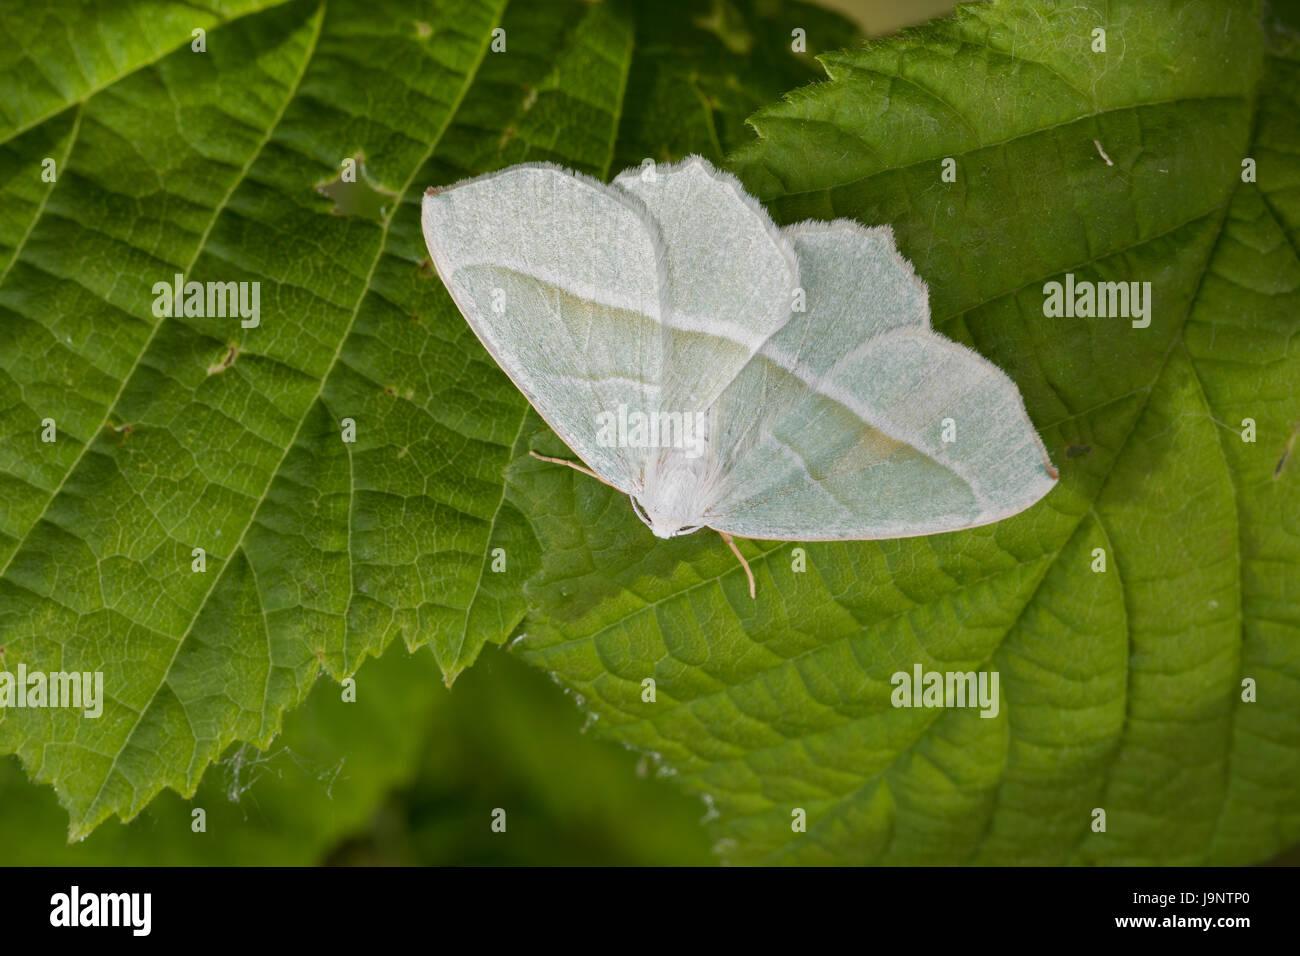 Silberblatt, Silberblattspanner, Silberblatt-Spanner, Perlglanzspanner, Perlglanz-Spanner, Campaea margaritata, - Stock Image